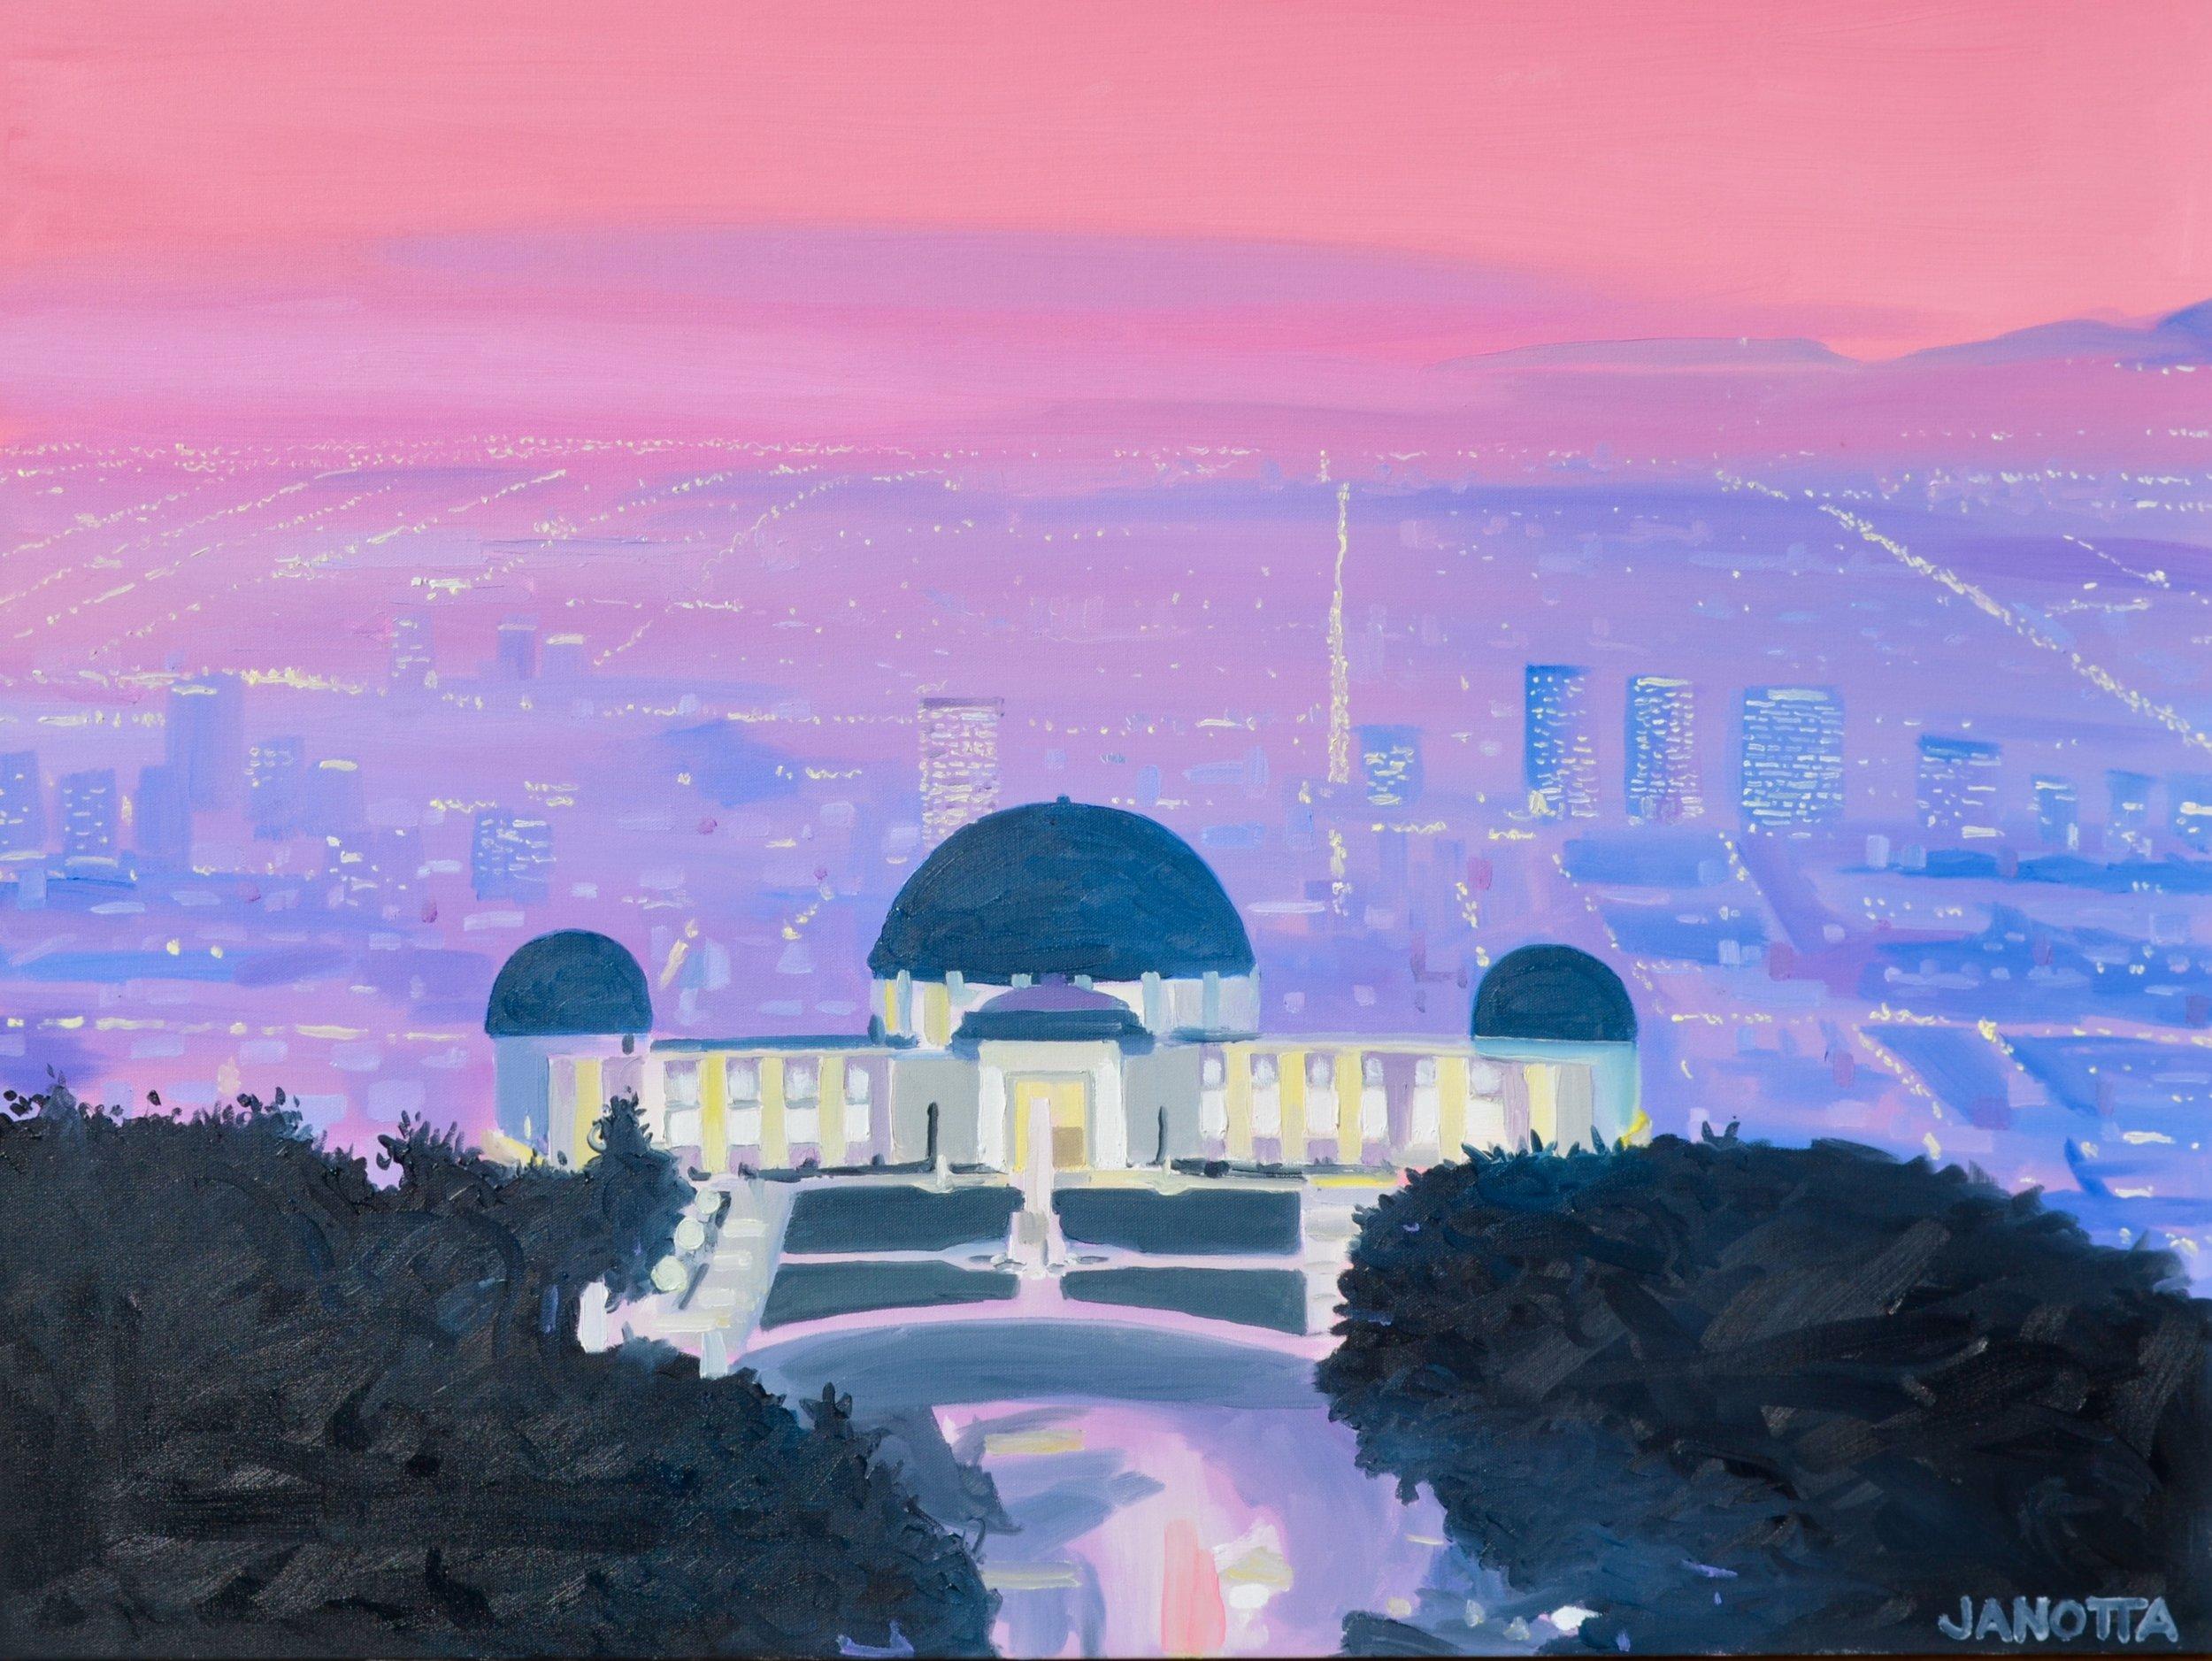 Janotta_Griffith Observatory_40x30.jpg